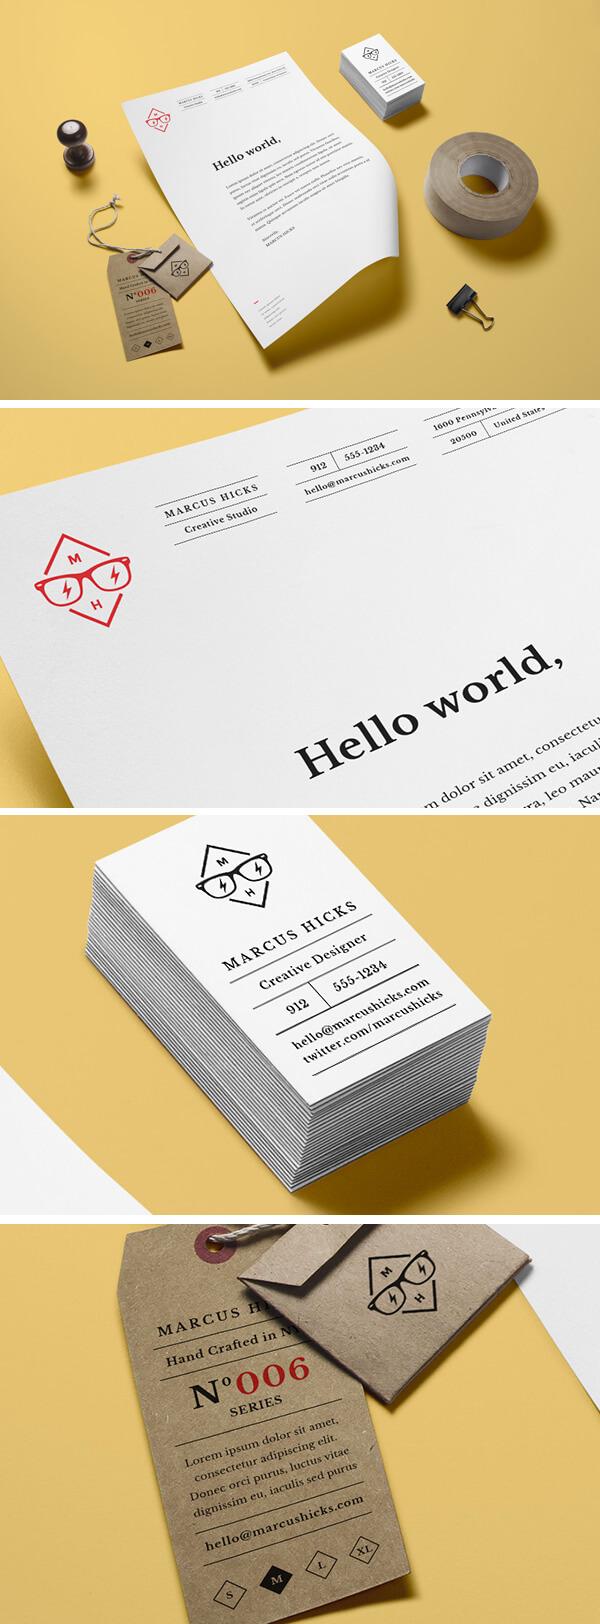 Branding Identity MockUp Vol.14